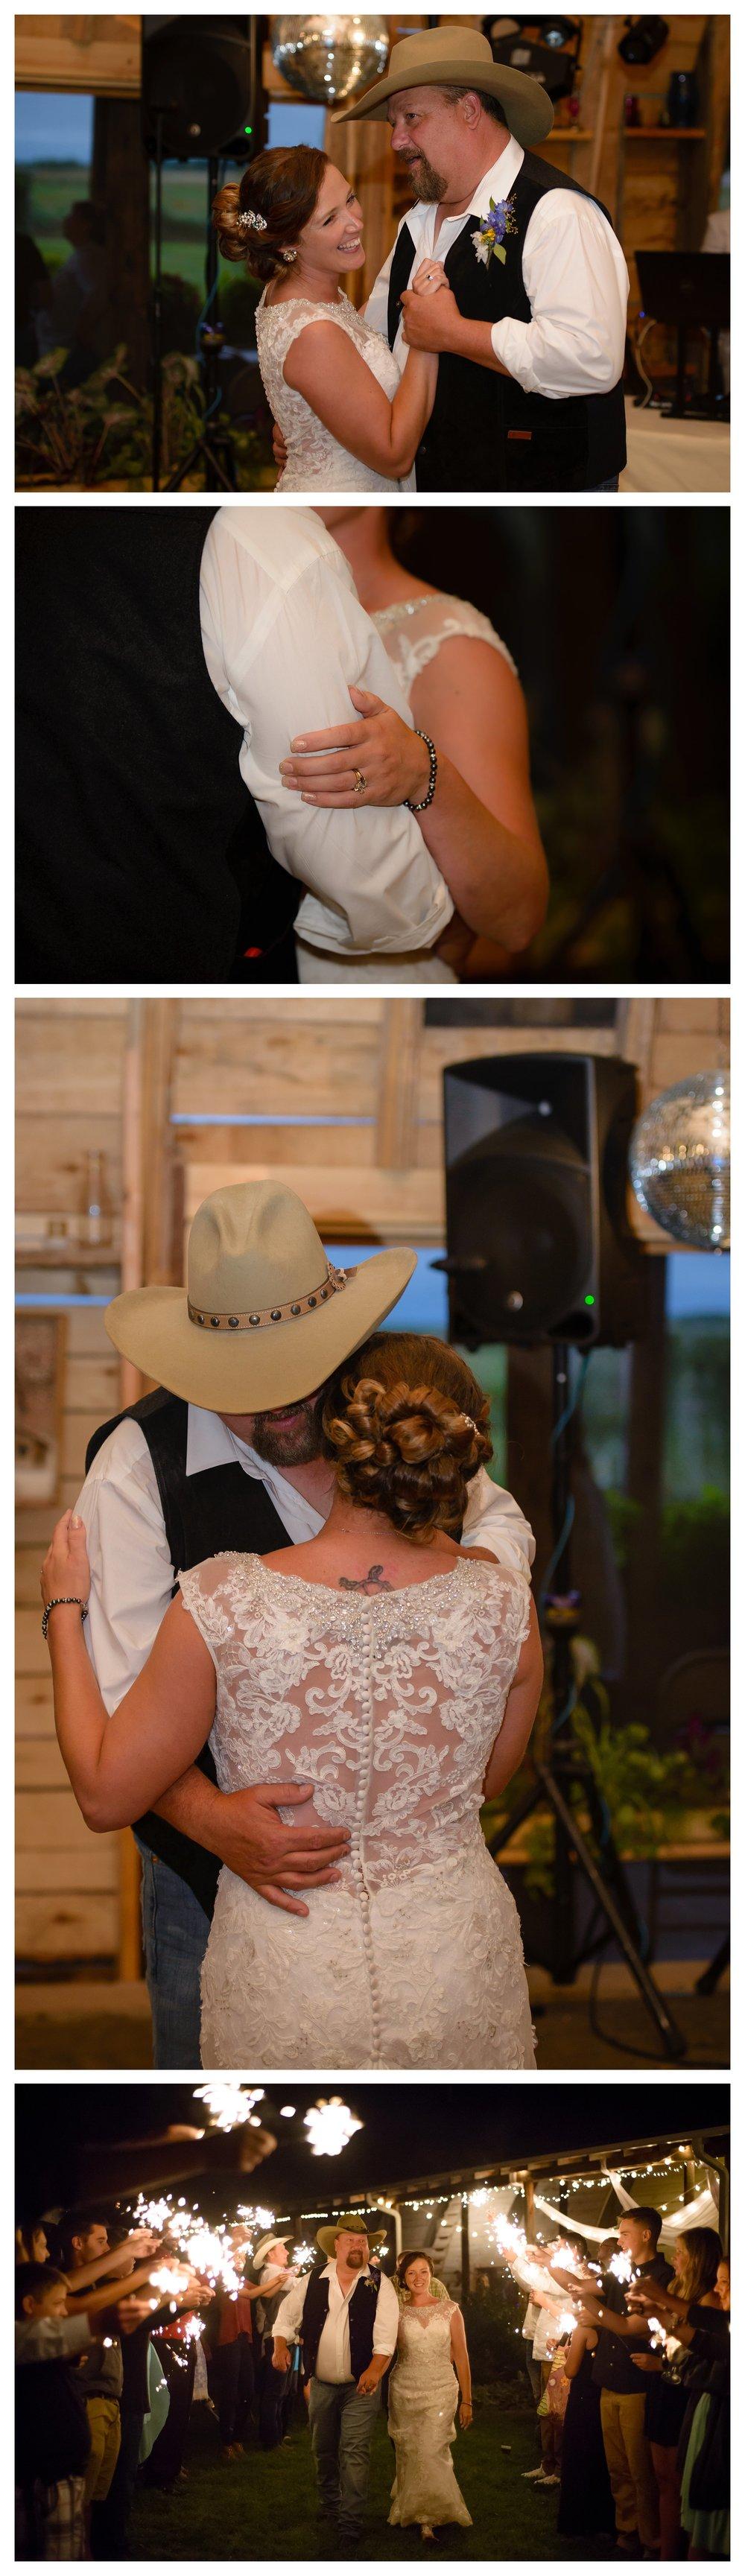 ps 139 photography jen jensen ashland freehands farm wedding northwoods_0045.jpg